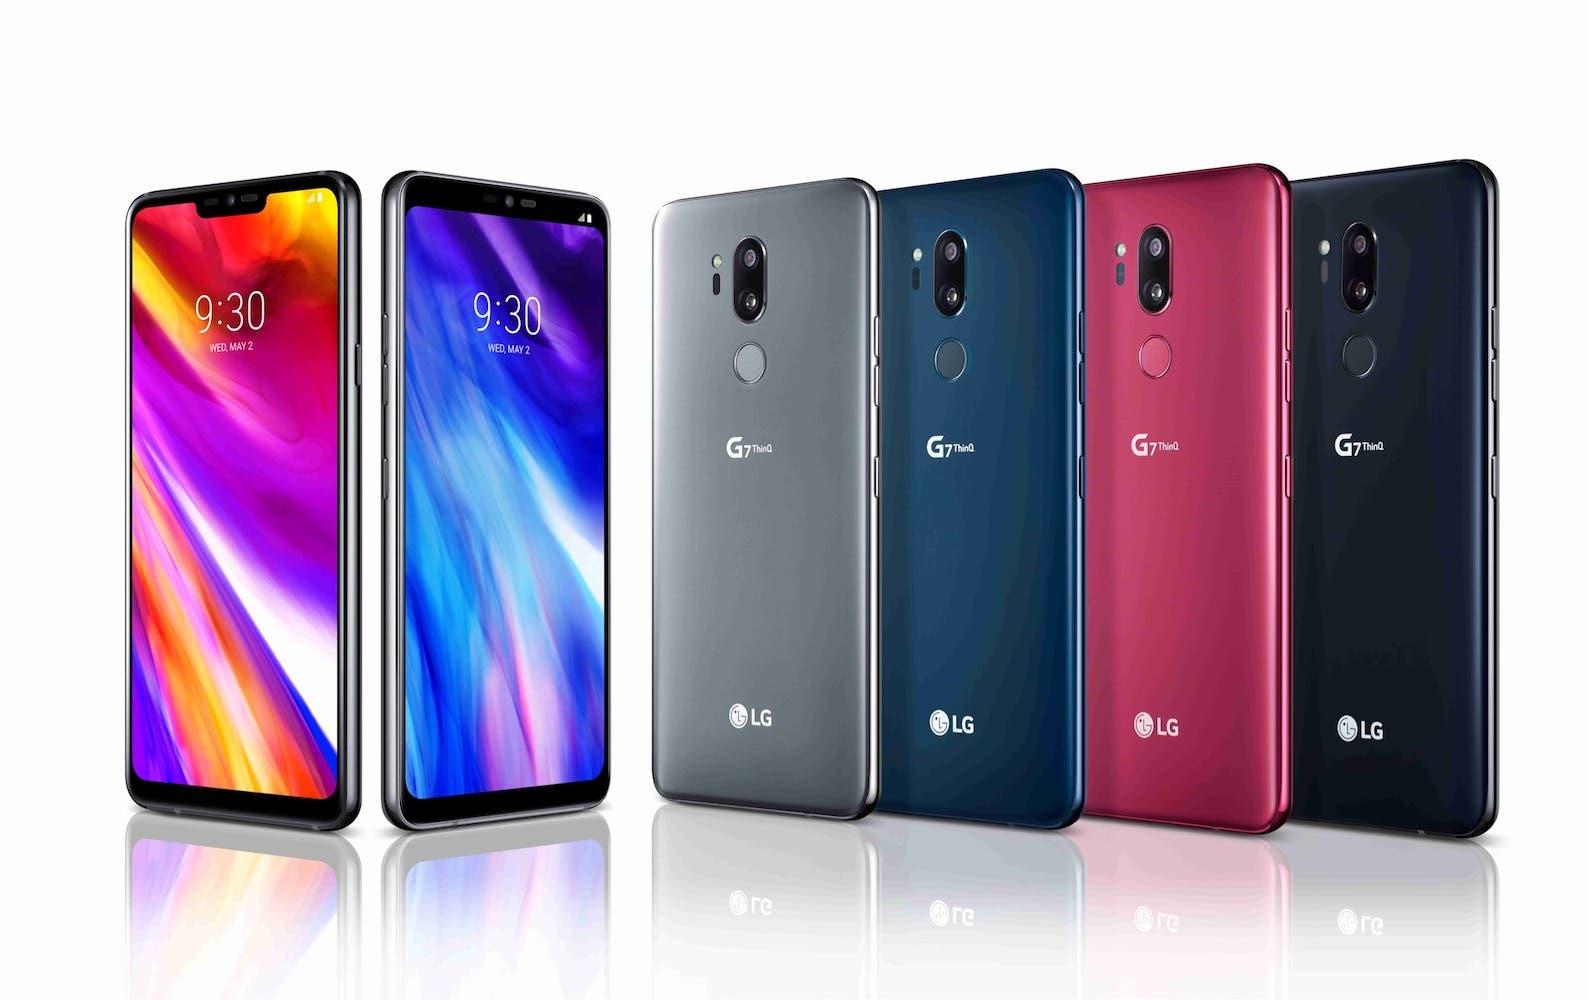 colores del LG G7 thingQ